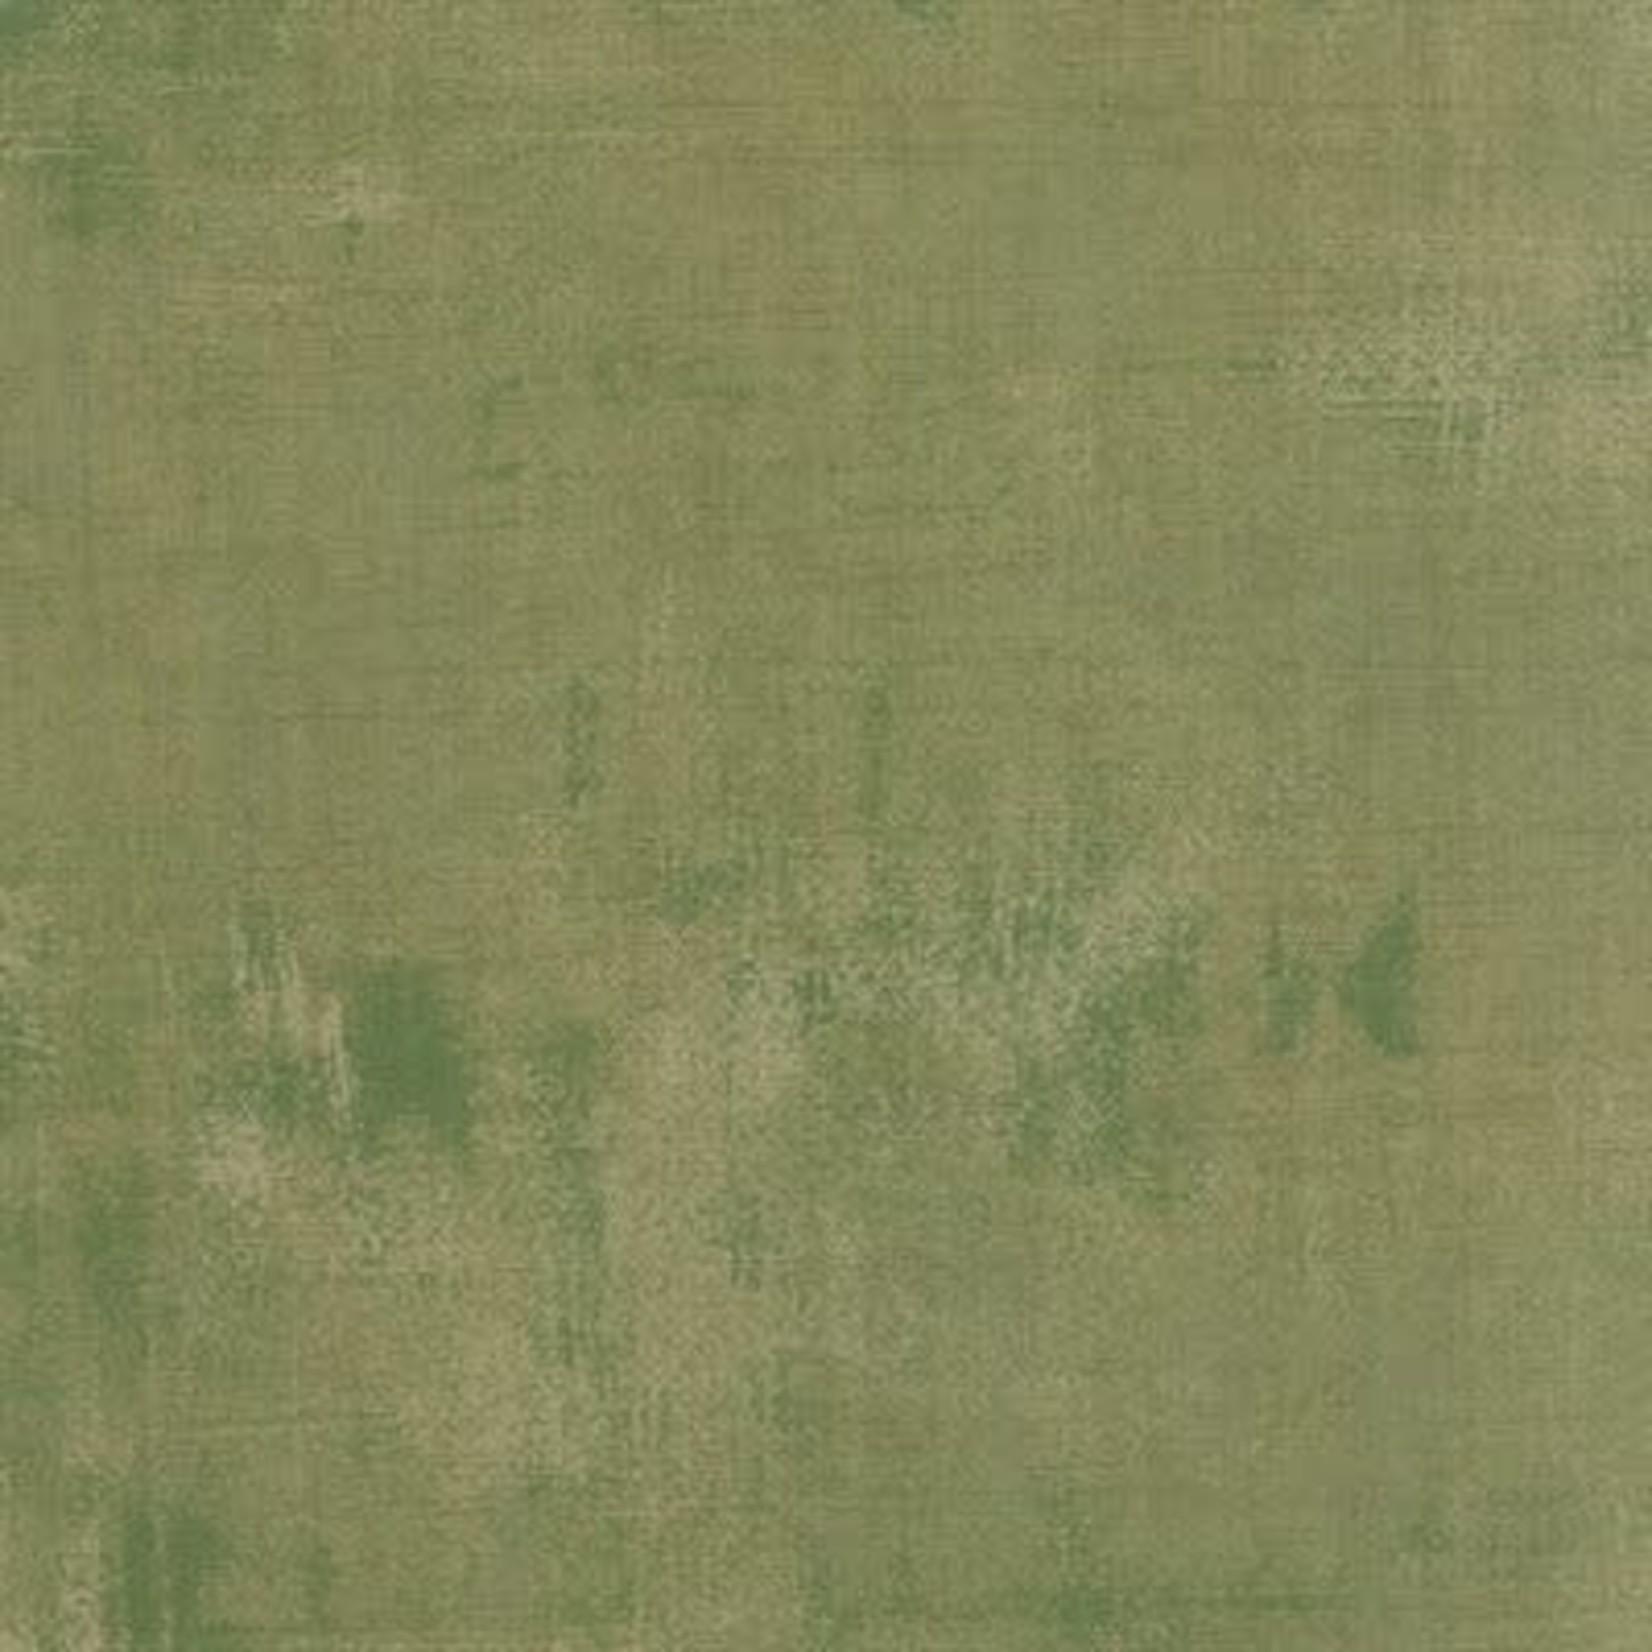 Moda Grunge Basics Grunge - Vert per cm or $20/m